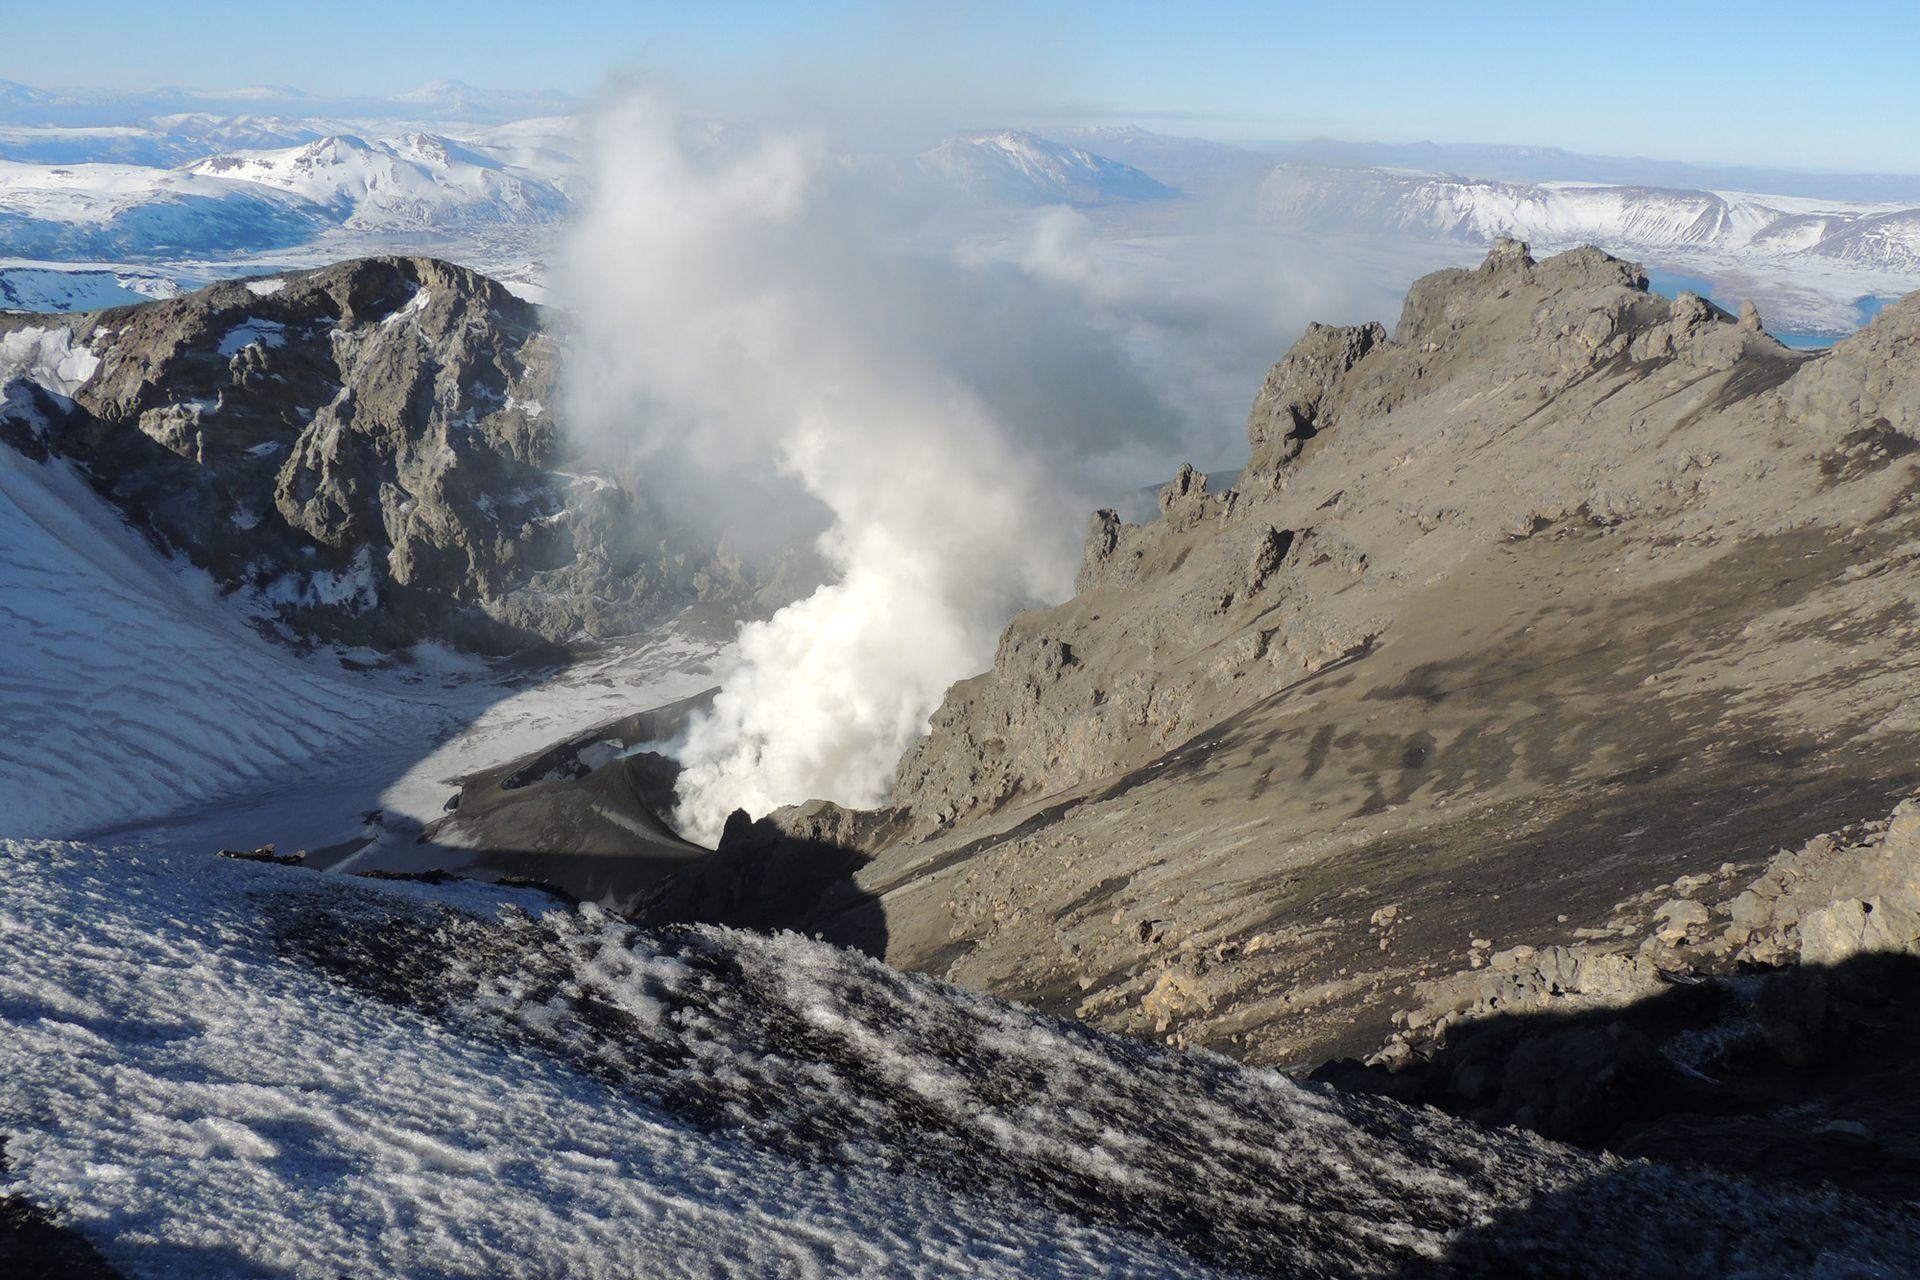 La meta de la travesía es la cumbre del Volcán Copahue.